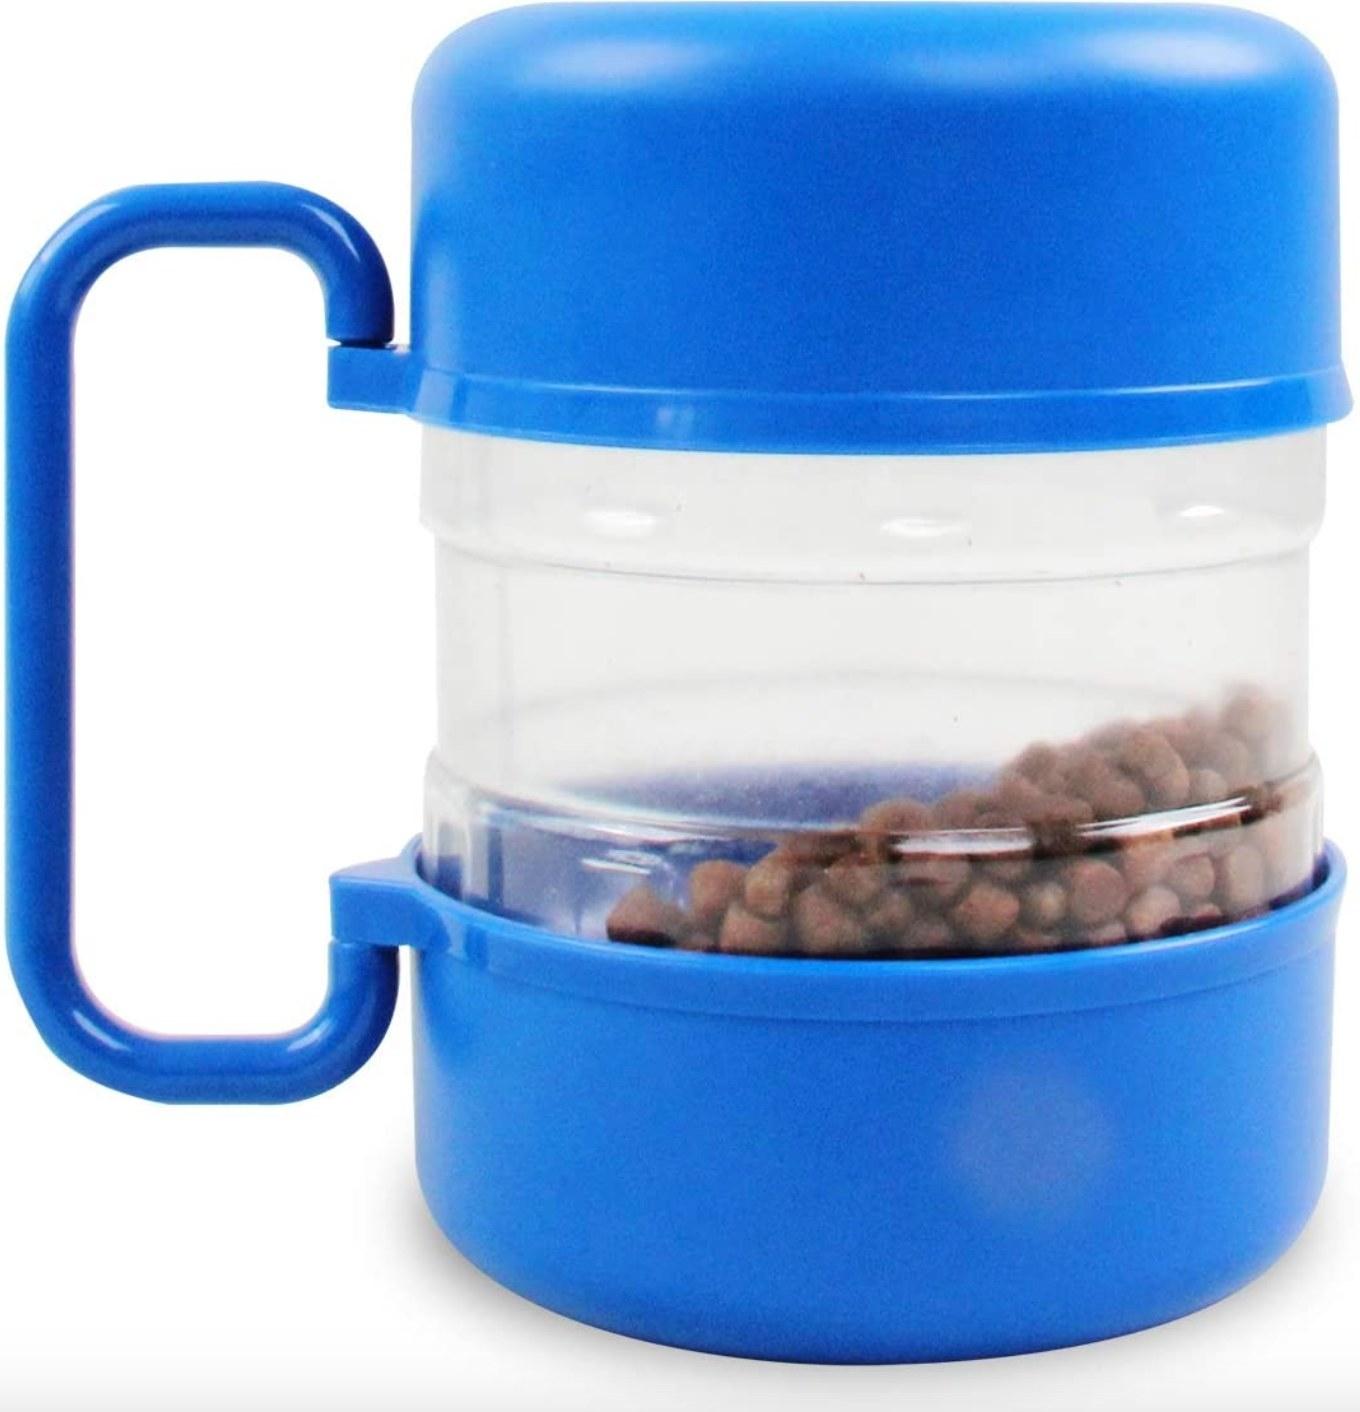 The travel dog food bin in  blue